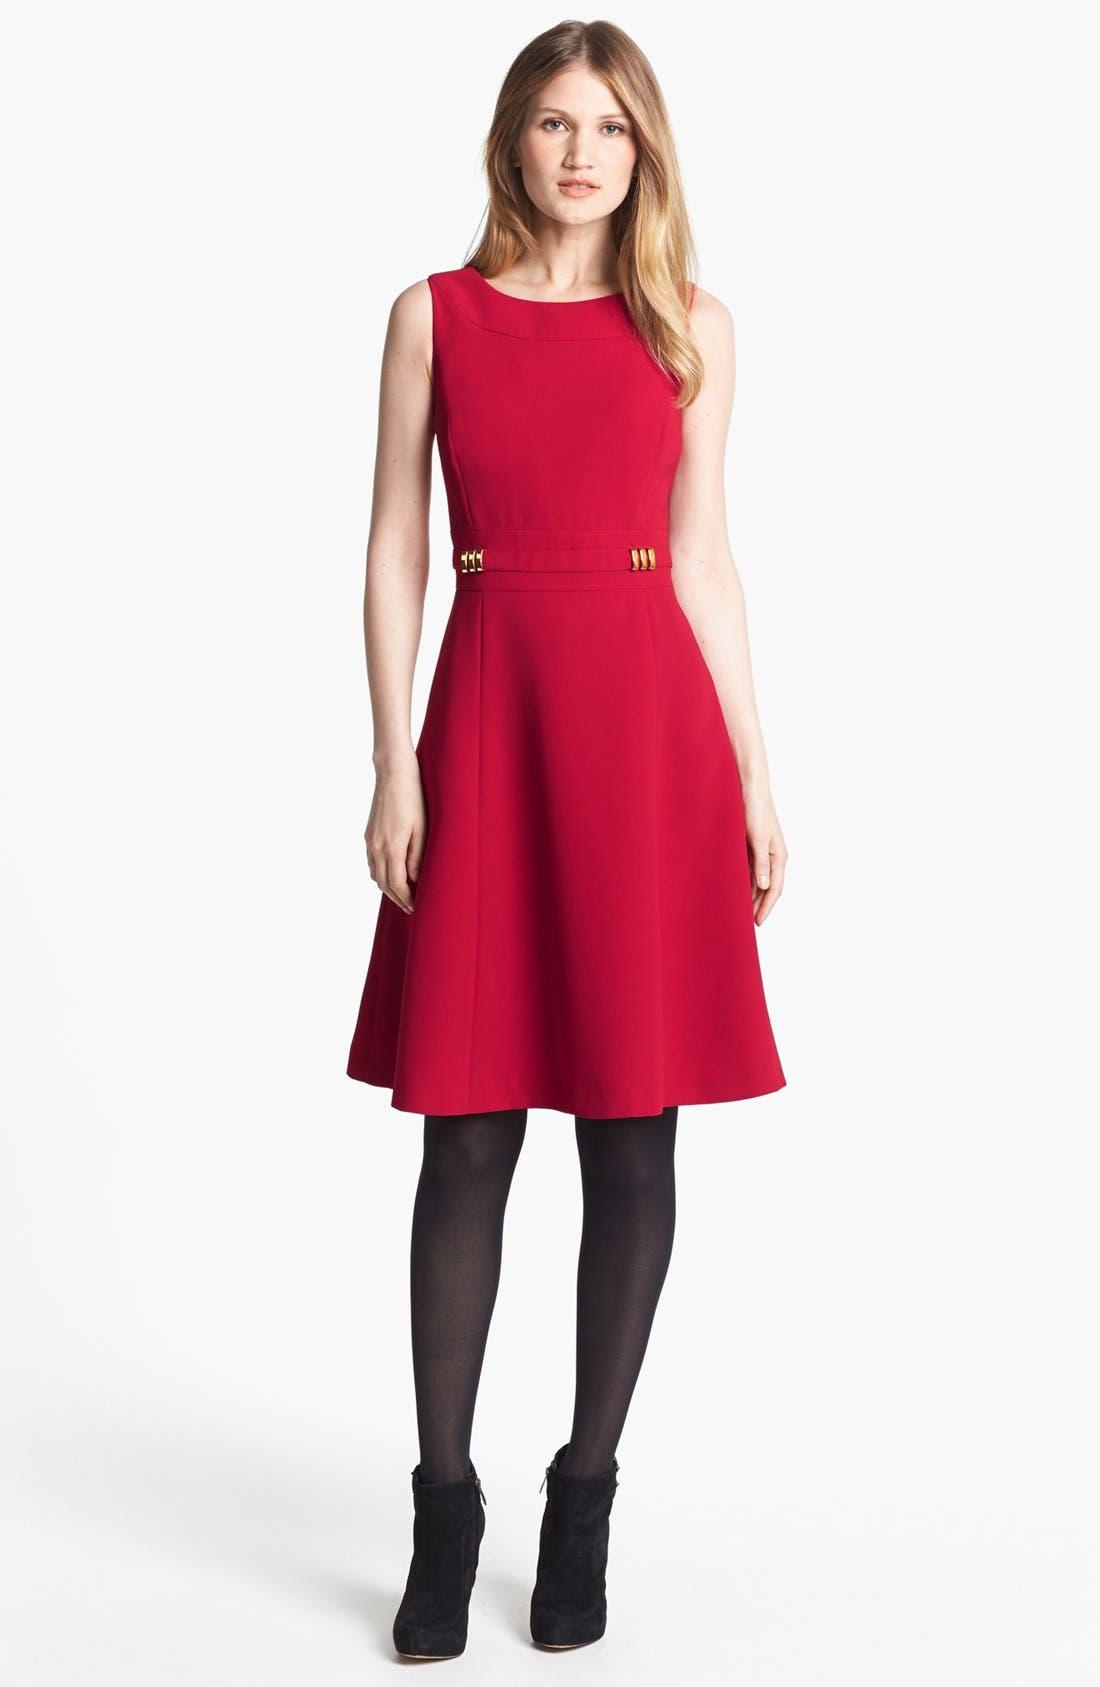 Main Image - Tahari Fit & Flare Dress  (Regular & Petite) (Regular Sizes Online Only)